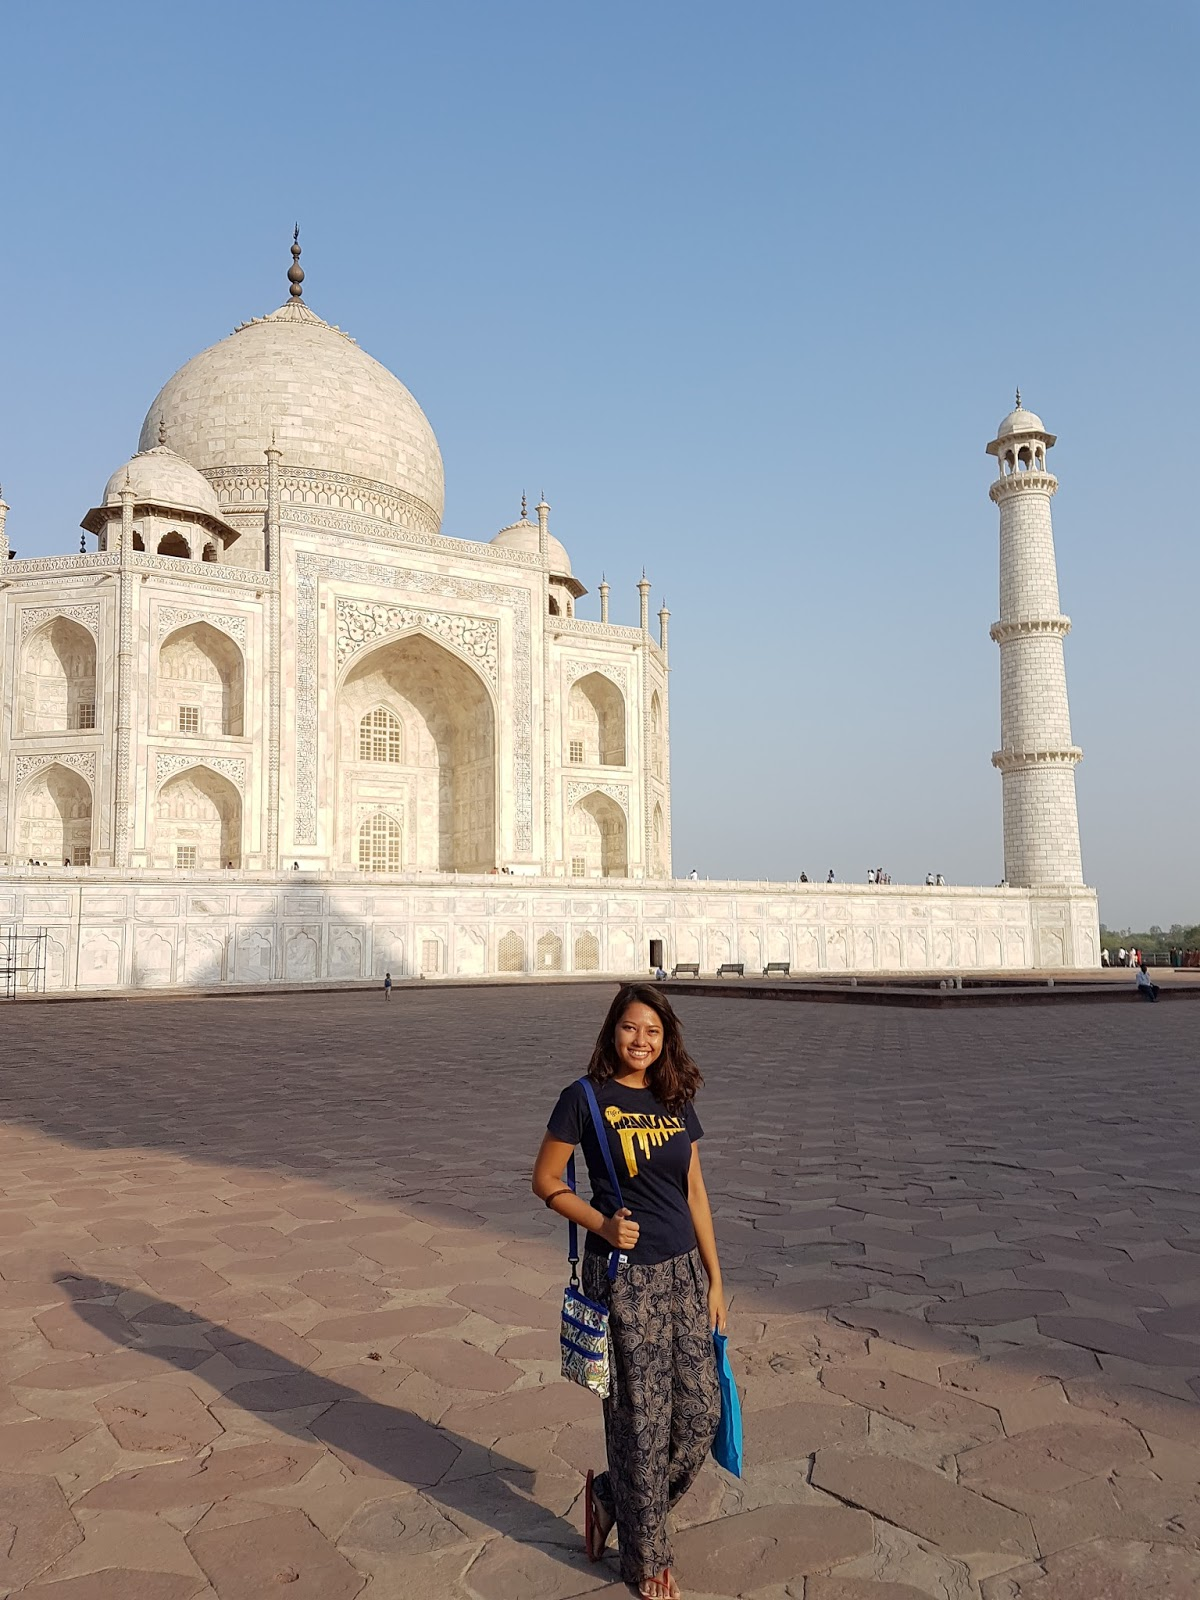 Behind Taj Mahal - Is Taj Mahal Worth Visiting or Overrated - Ummi Goes Where?